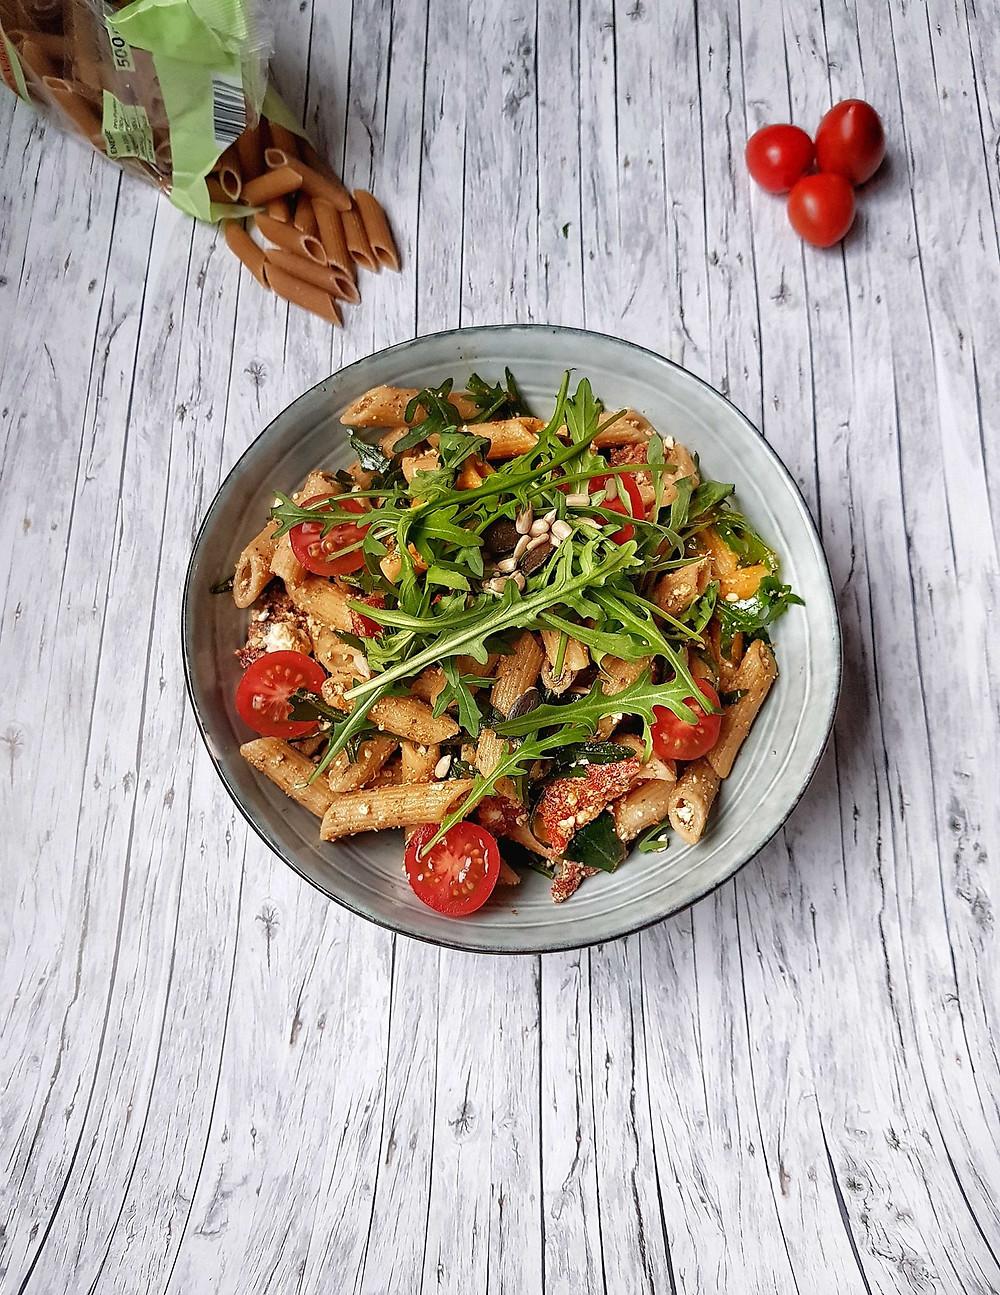 nudelsalat, pestosalat, pastasalat, mediterran, Salat, frisch, gesund, Frühling, Grillsaison, Partyrezept, Crowdfeeder, Grillrezept